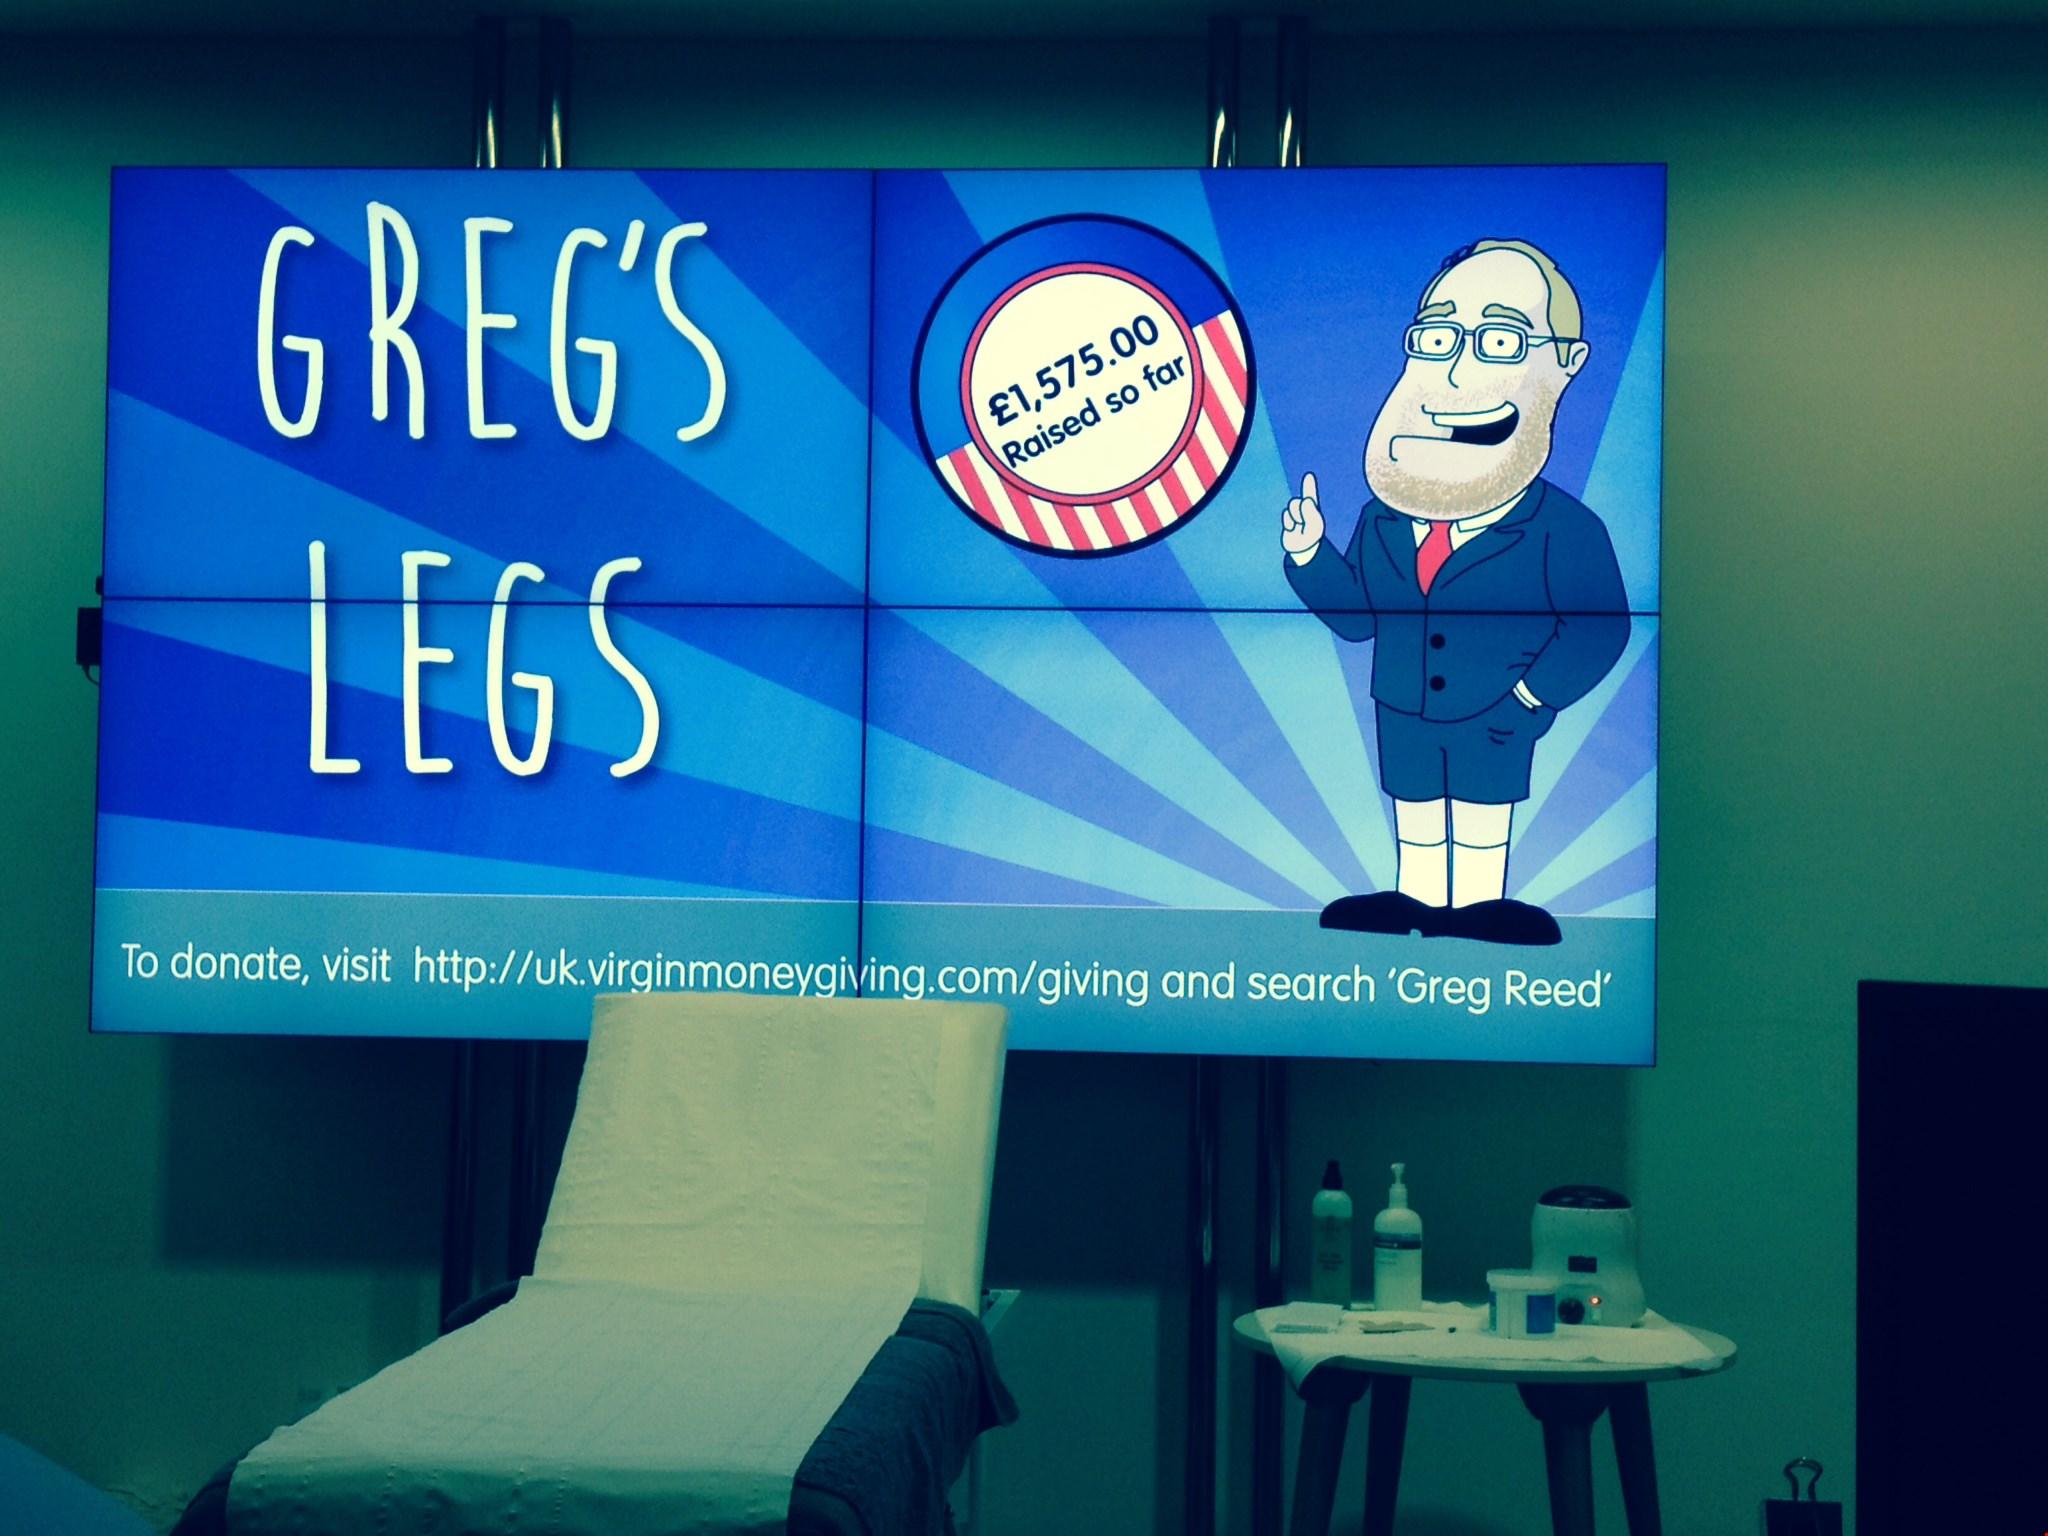 Greg's legs